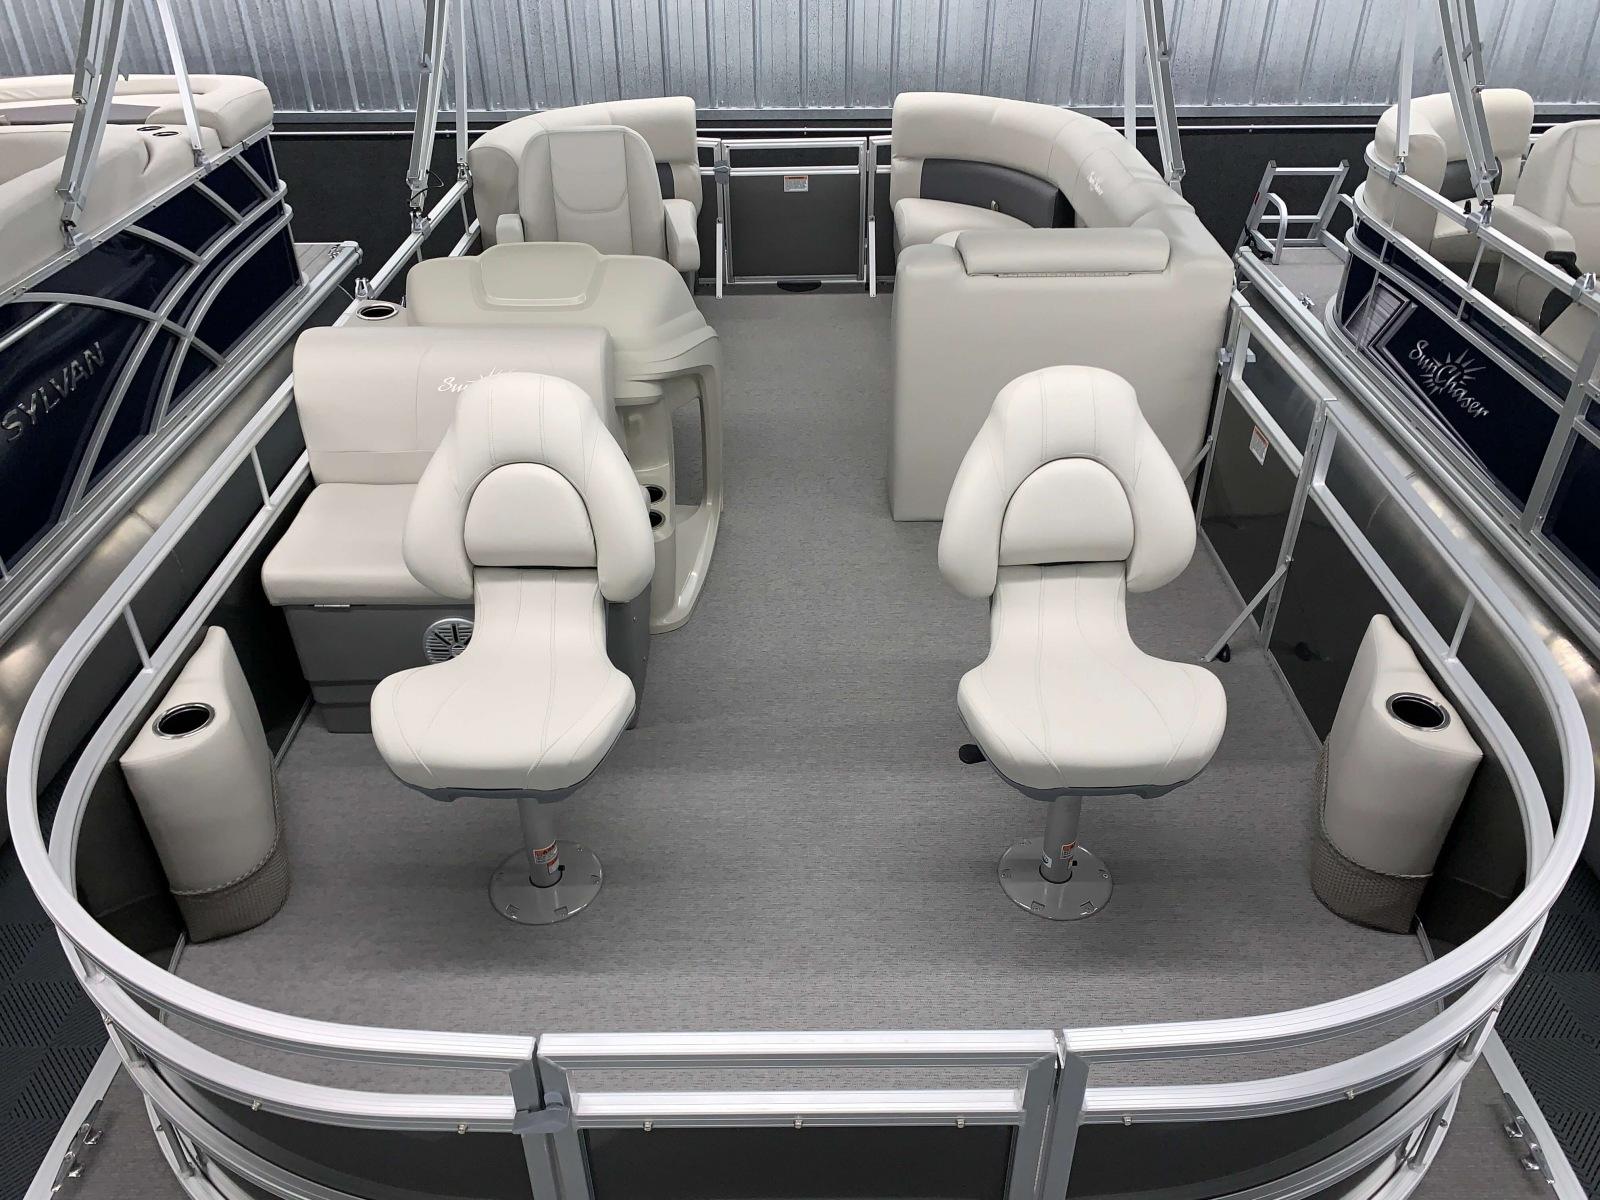 Fishing Station of a 2020 SunChaser Vista 18 Fish Pontoon Boat